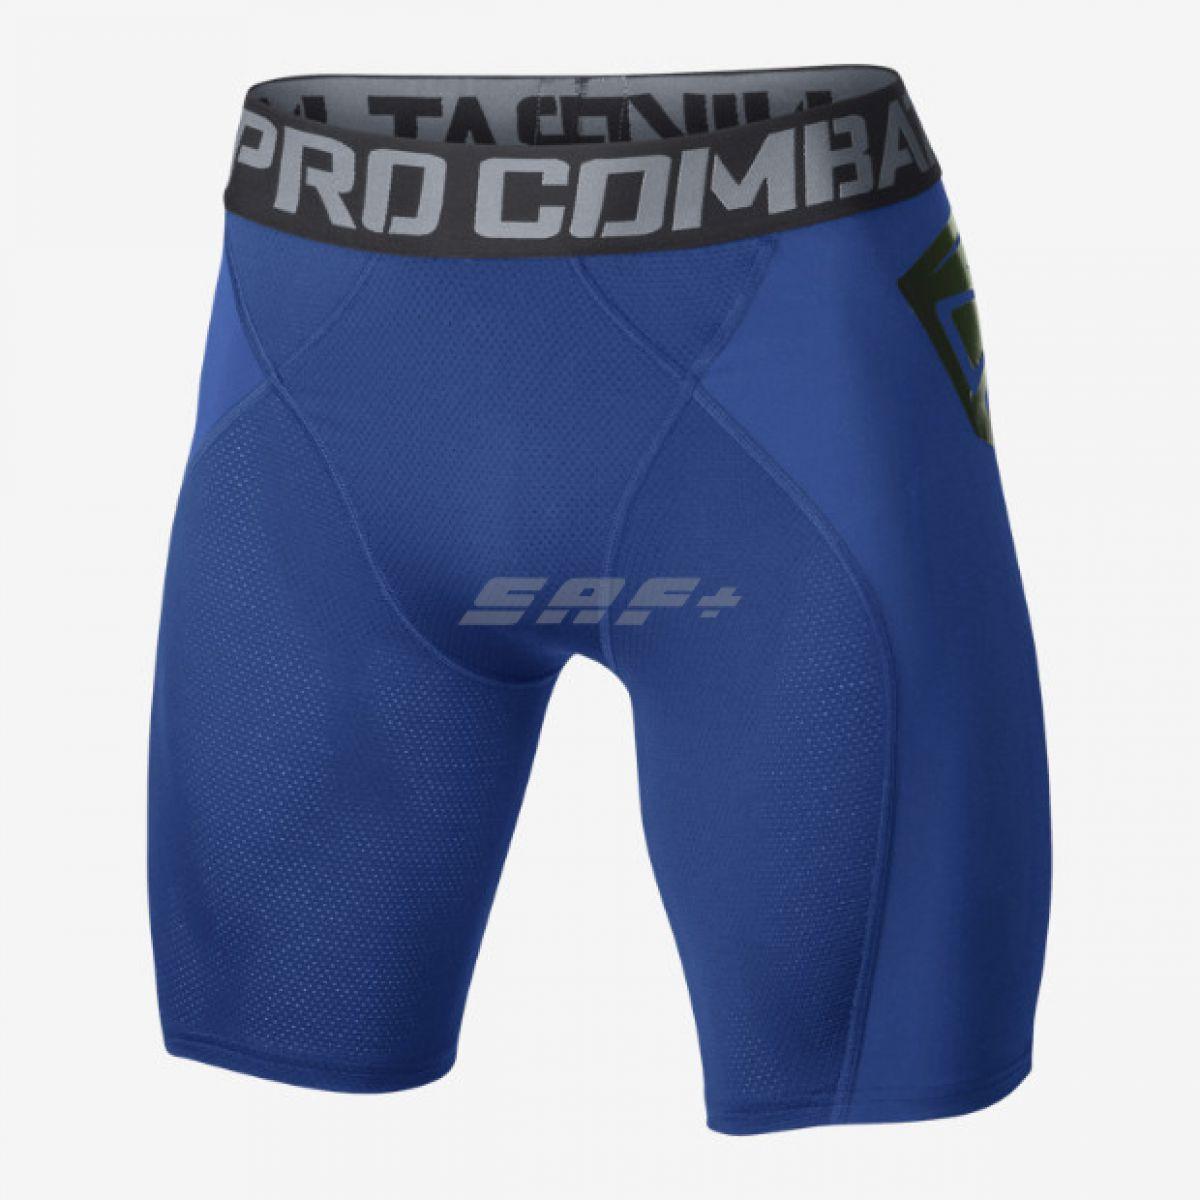 Nike Pro Трусы Npc Ultralight Slider Short 575273-493 Sr